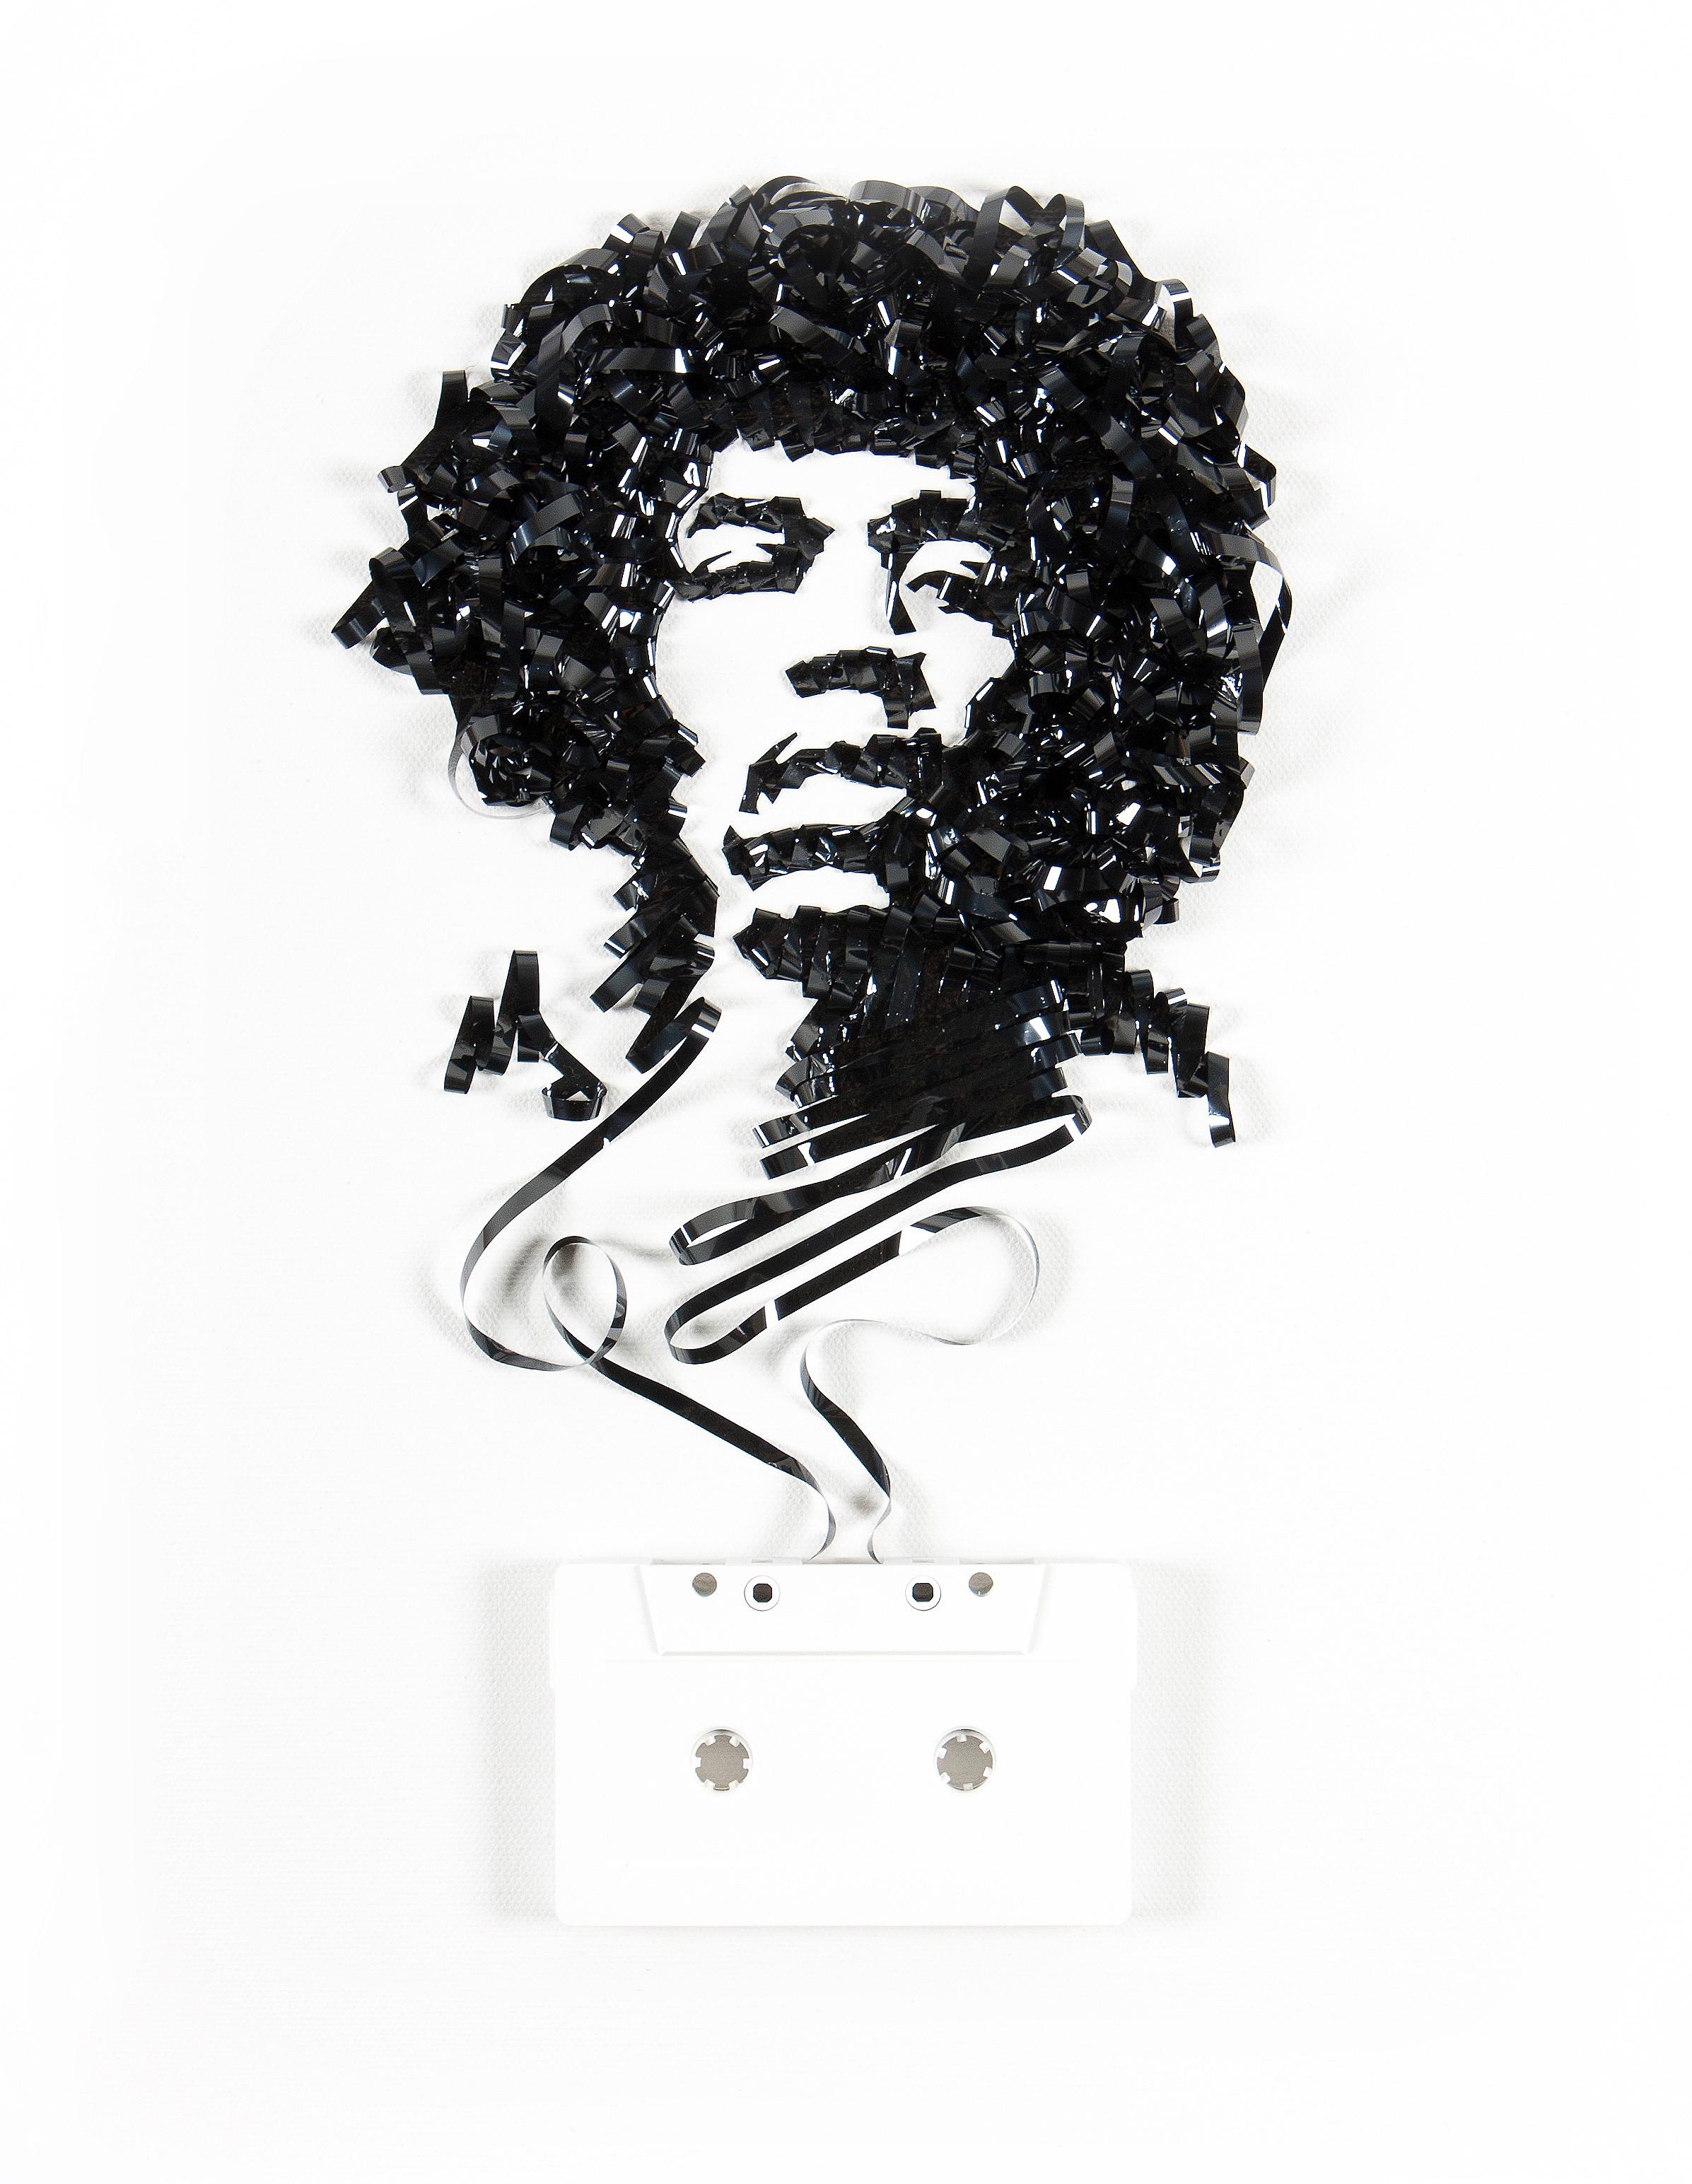 Ghost in the Machine - Jimi Hendrixby Iri5